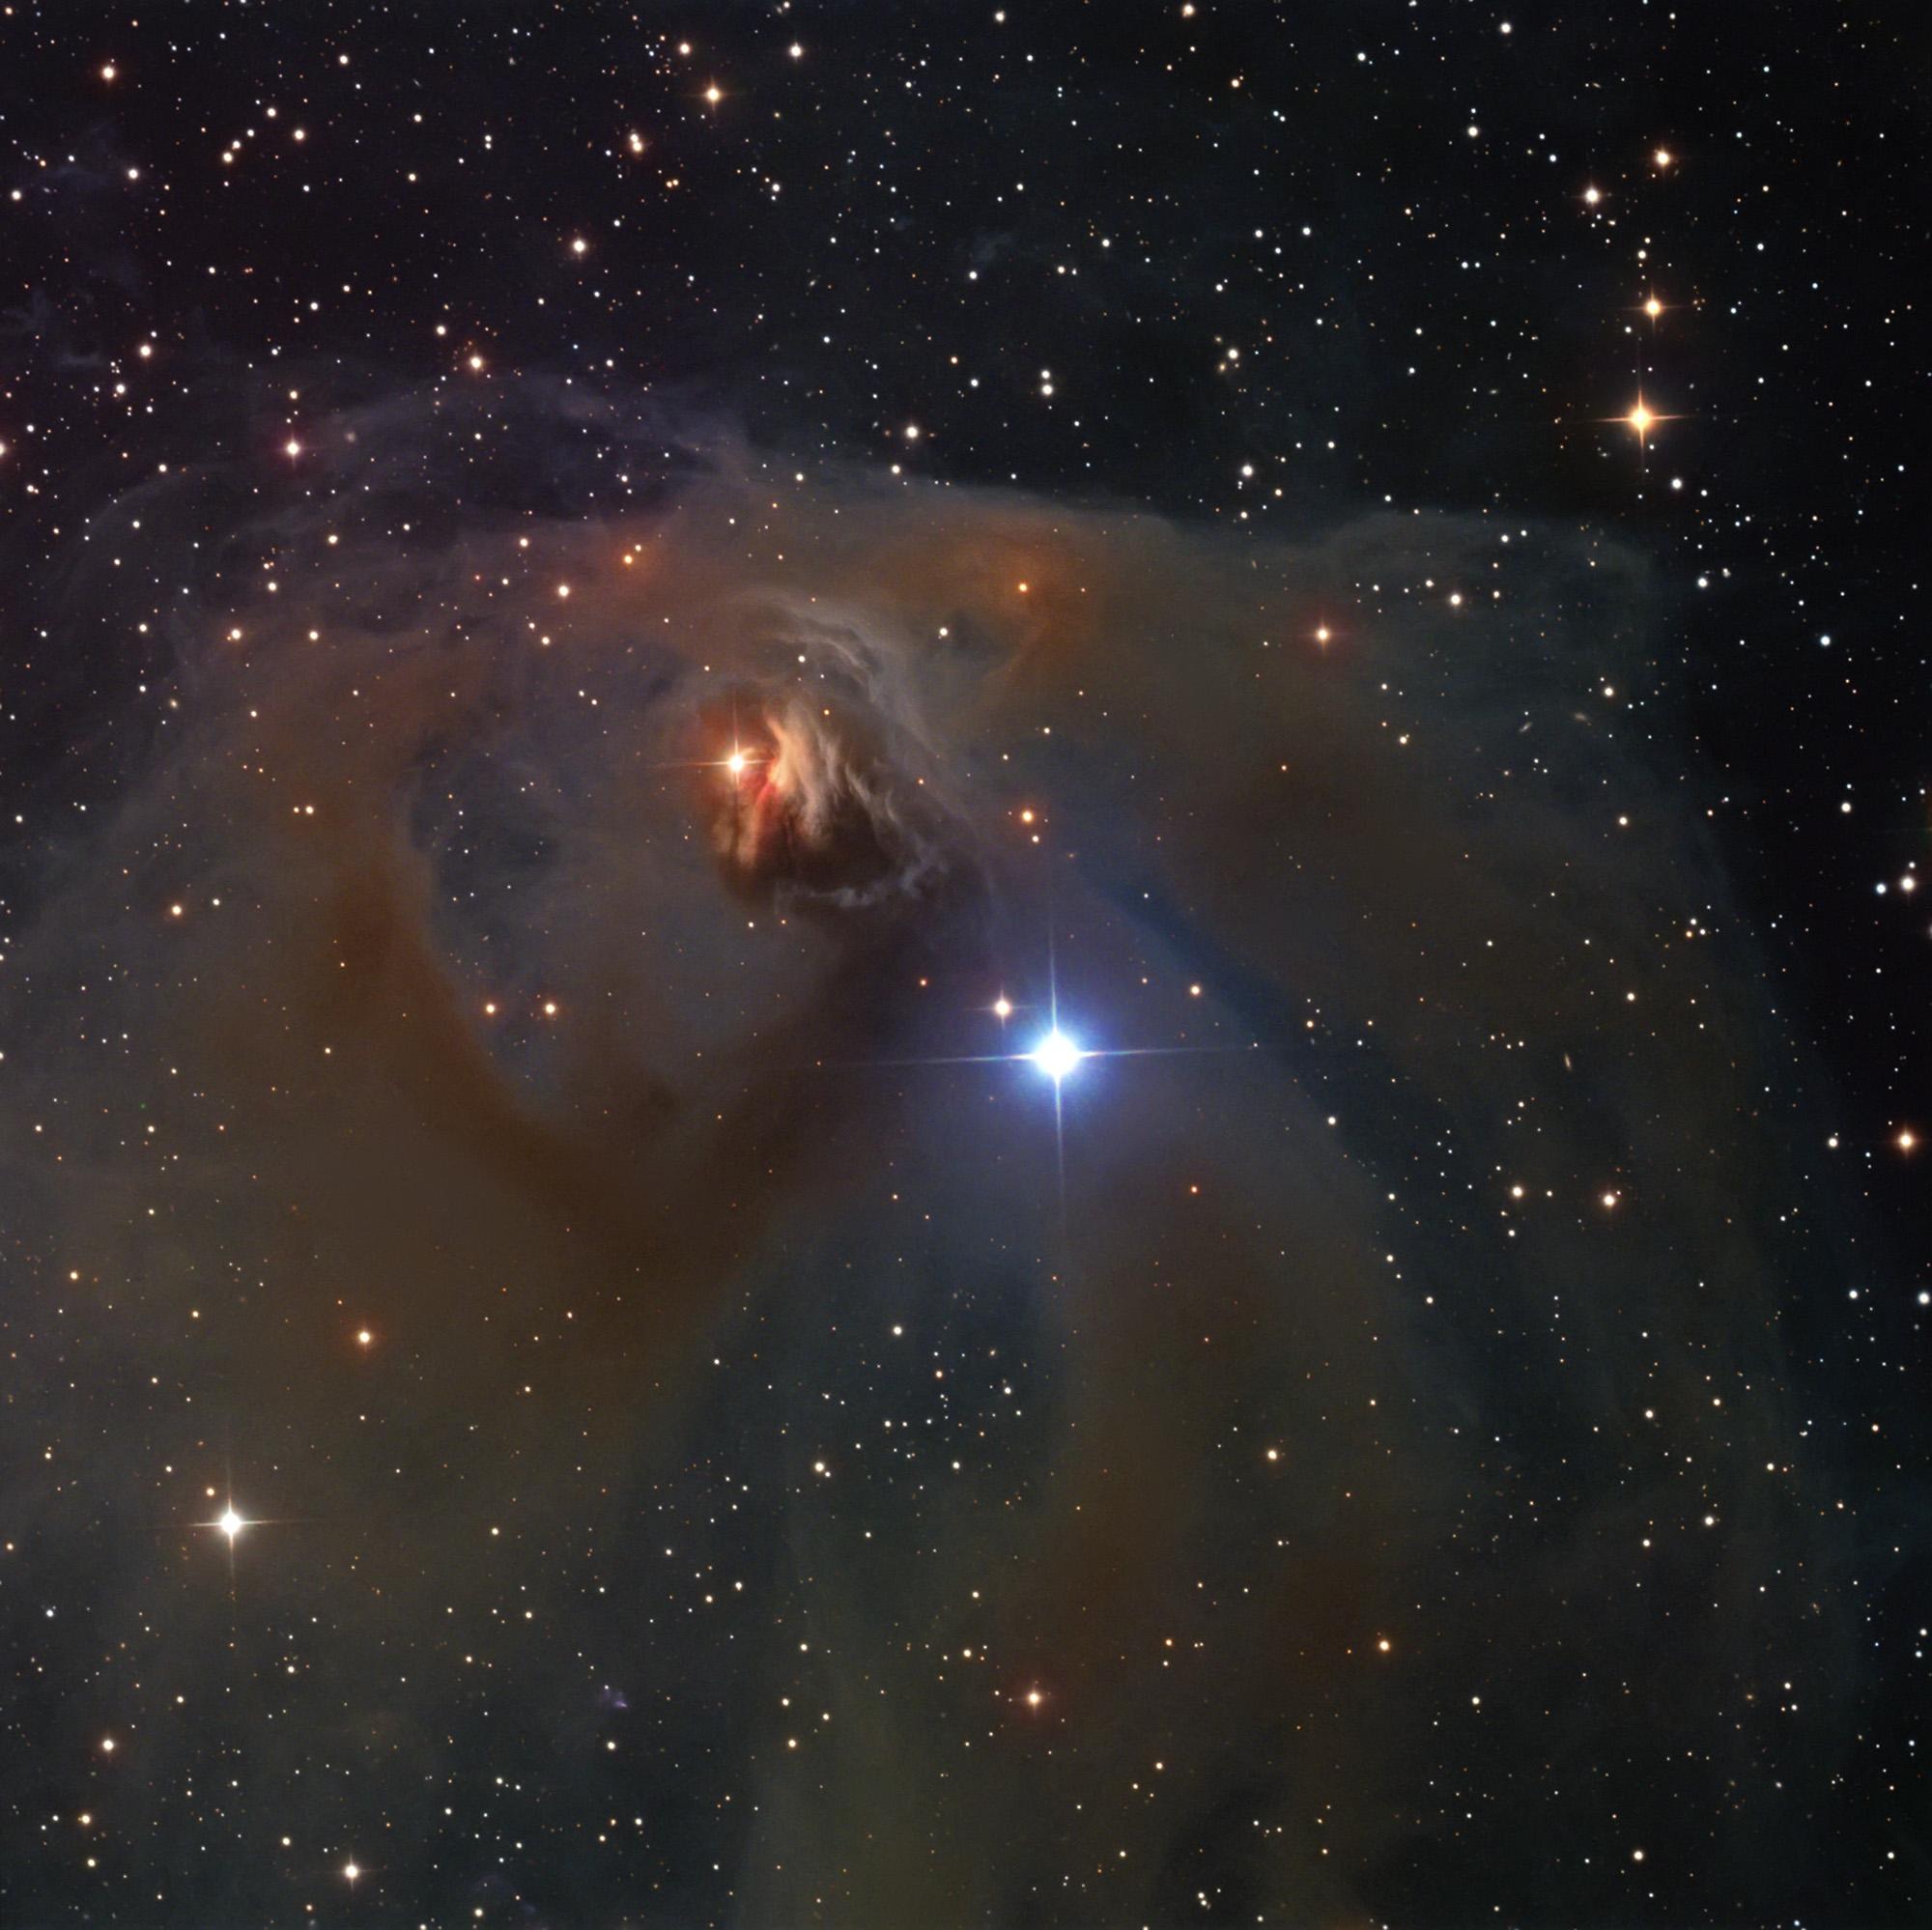 NGC 1555 (Hind´s Variable Nebula) in Taurus